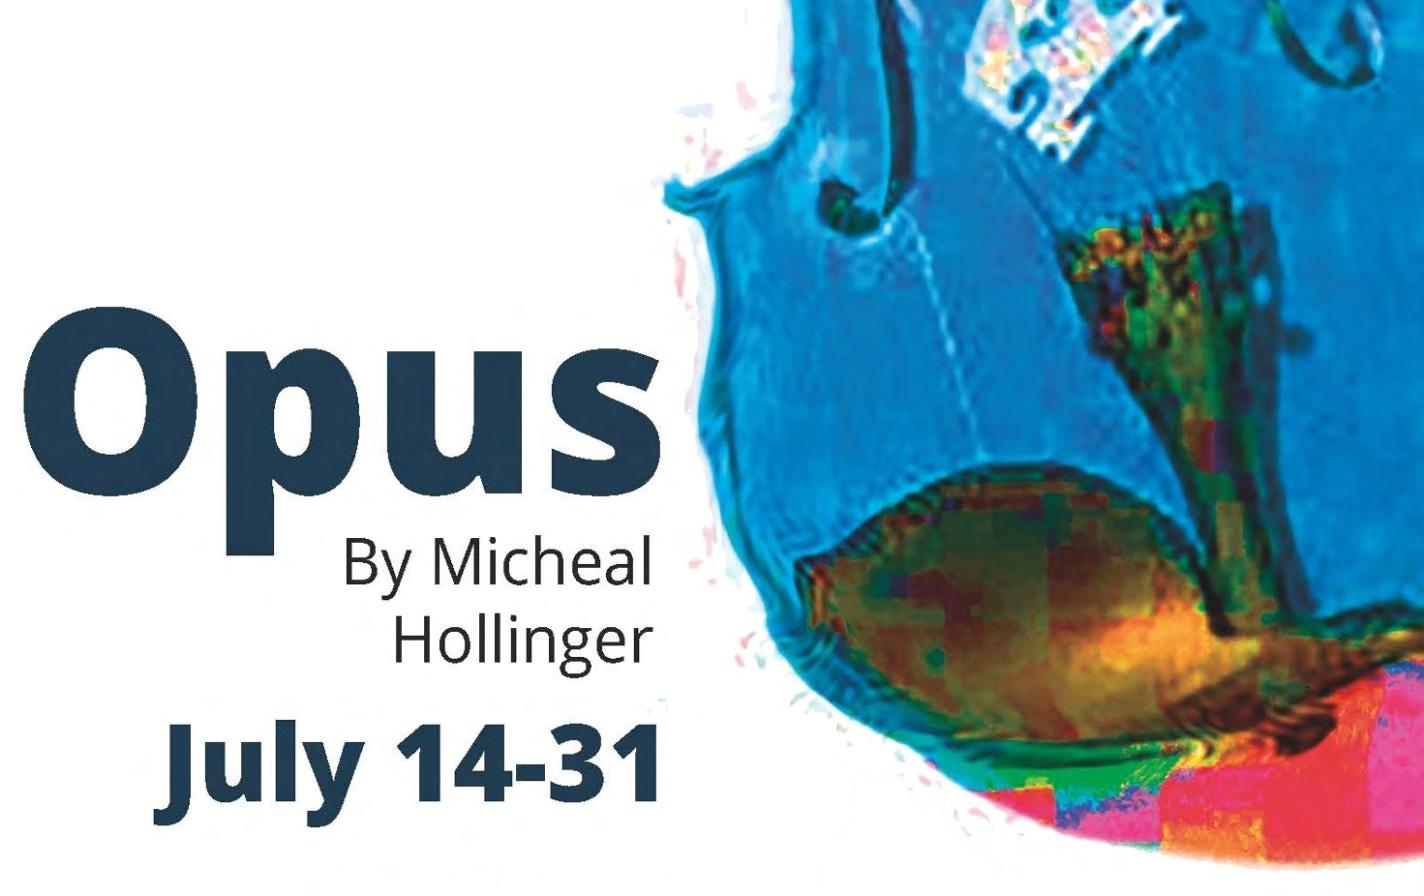 Playbill-Opus